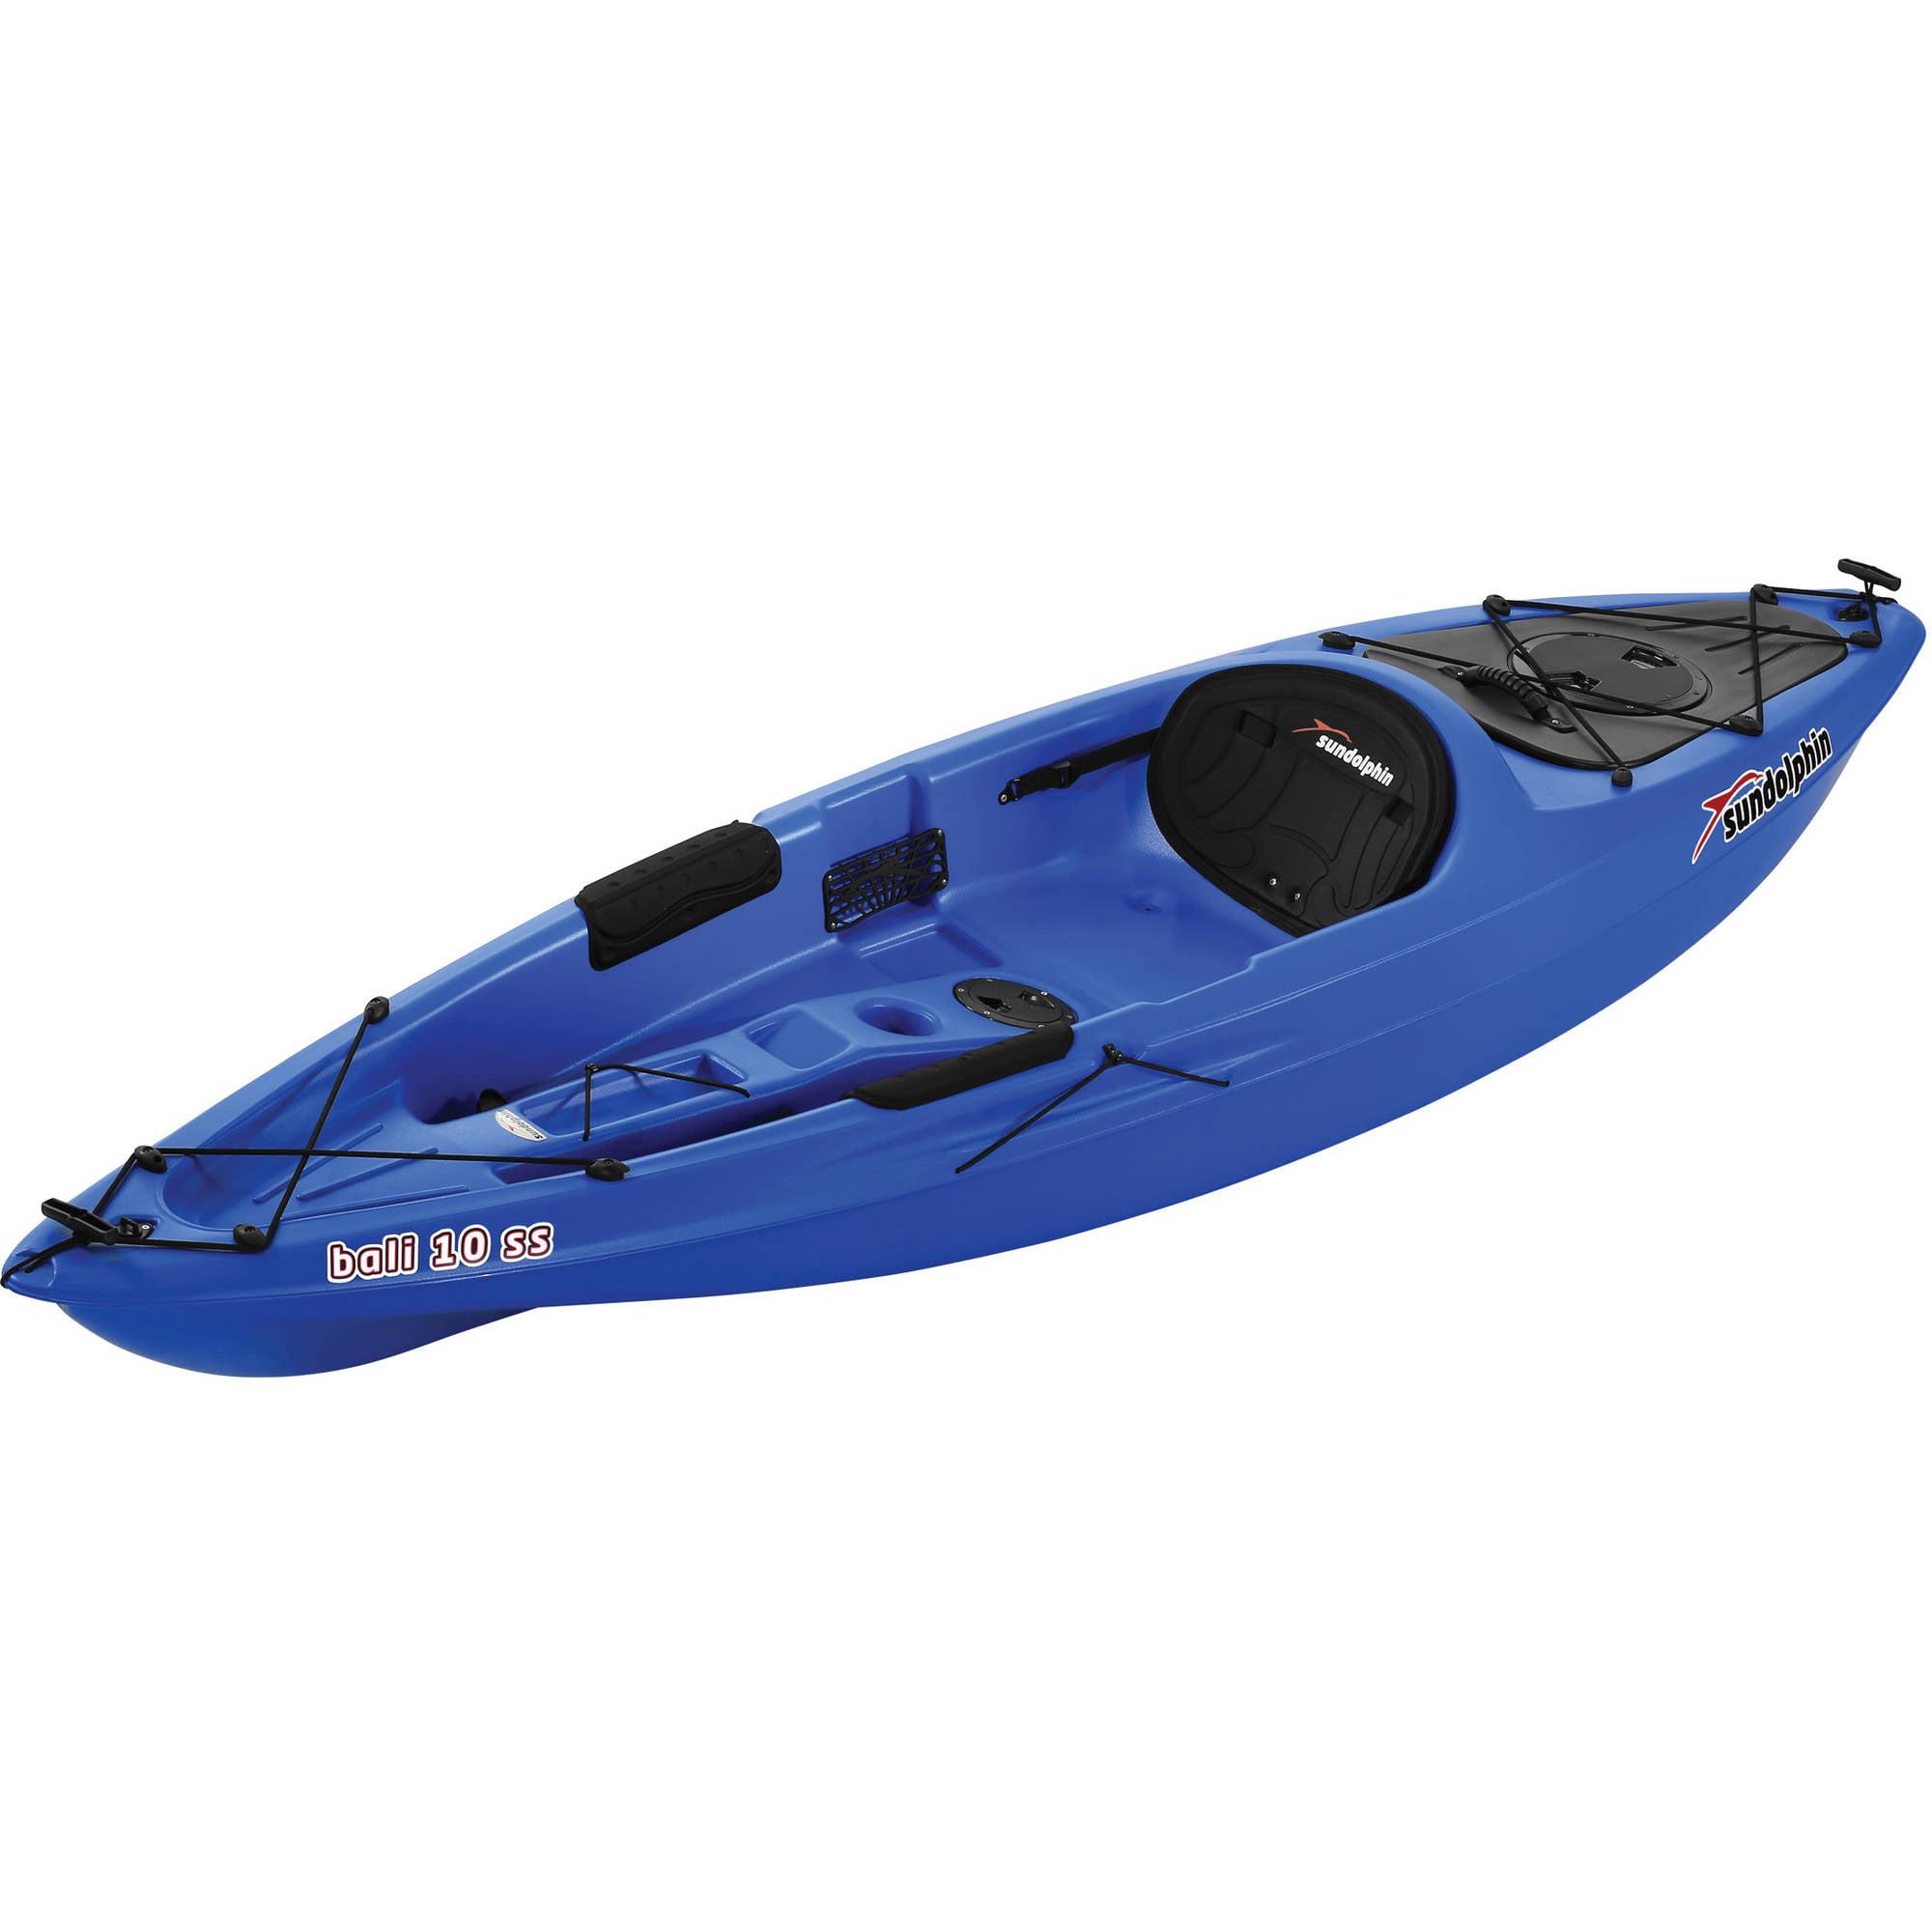 Sun dolphin bali 10 39 sit on kayak dark blue ocean boat for Sun dolphin fishing boat